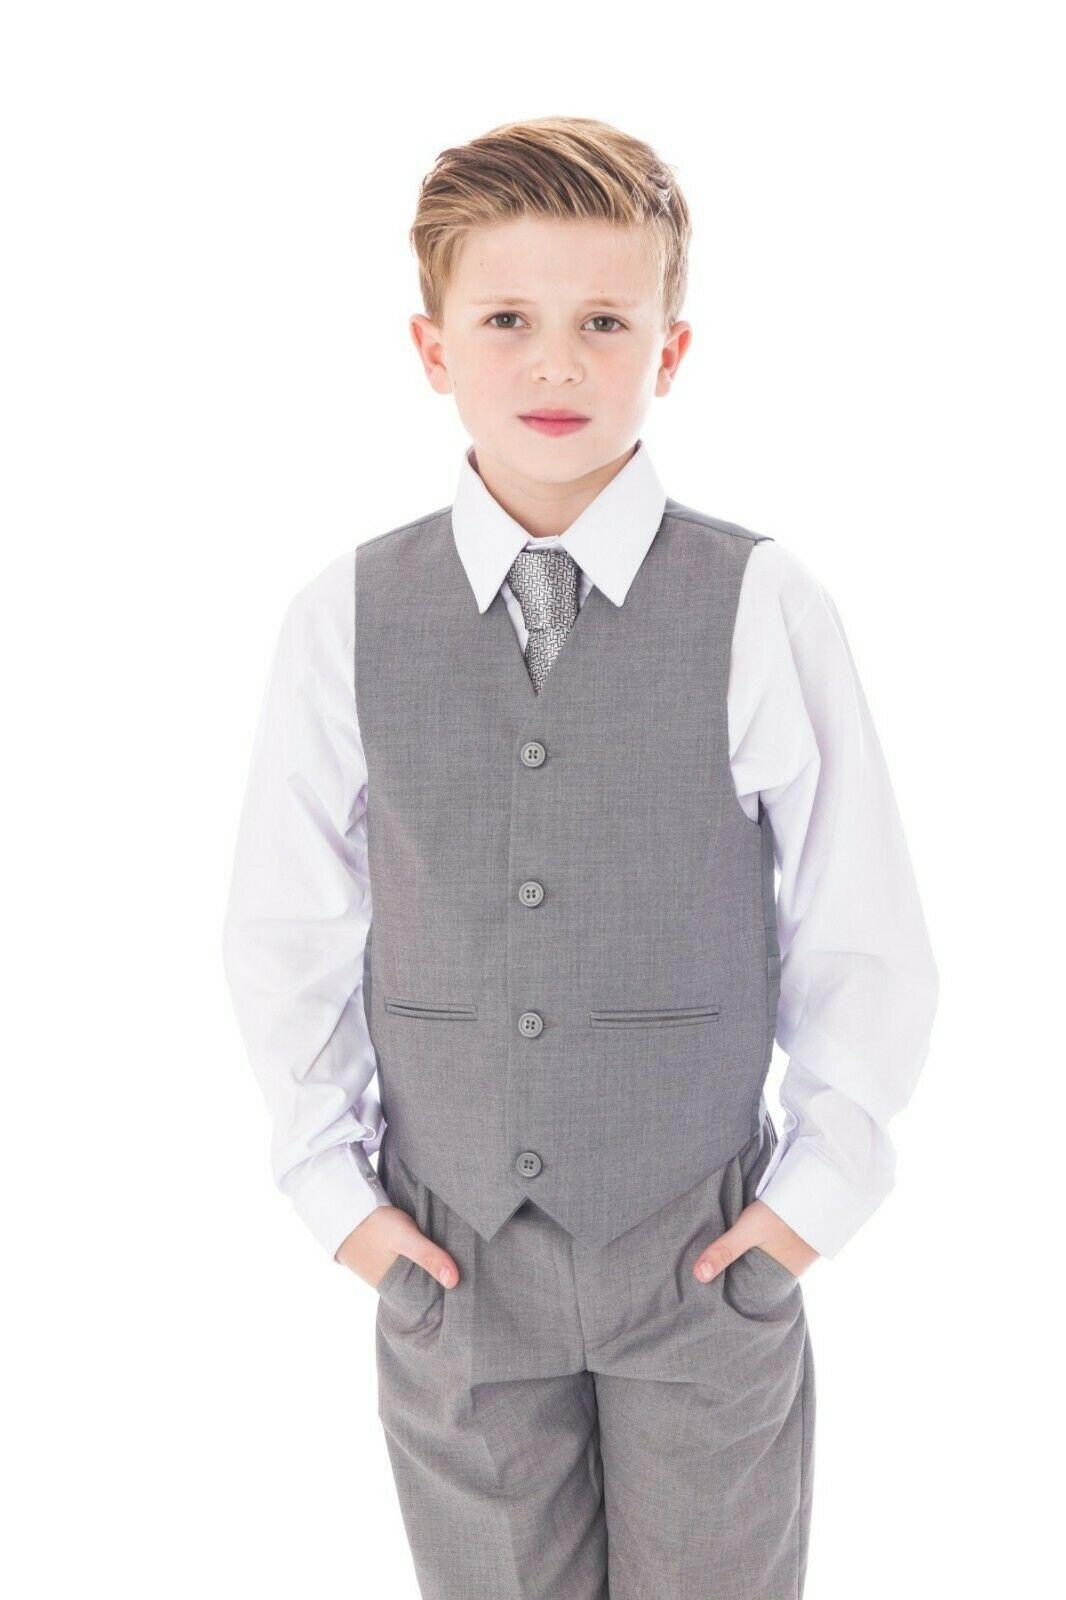 Jungen Anzug, 5-teilig, grau - Melli-Trends